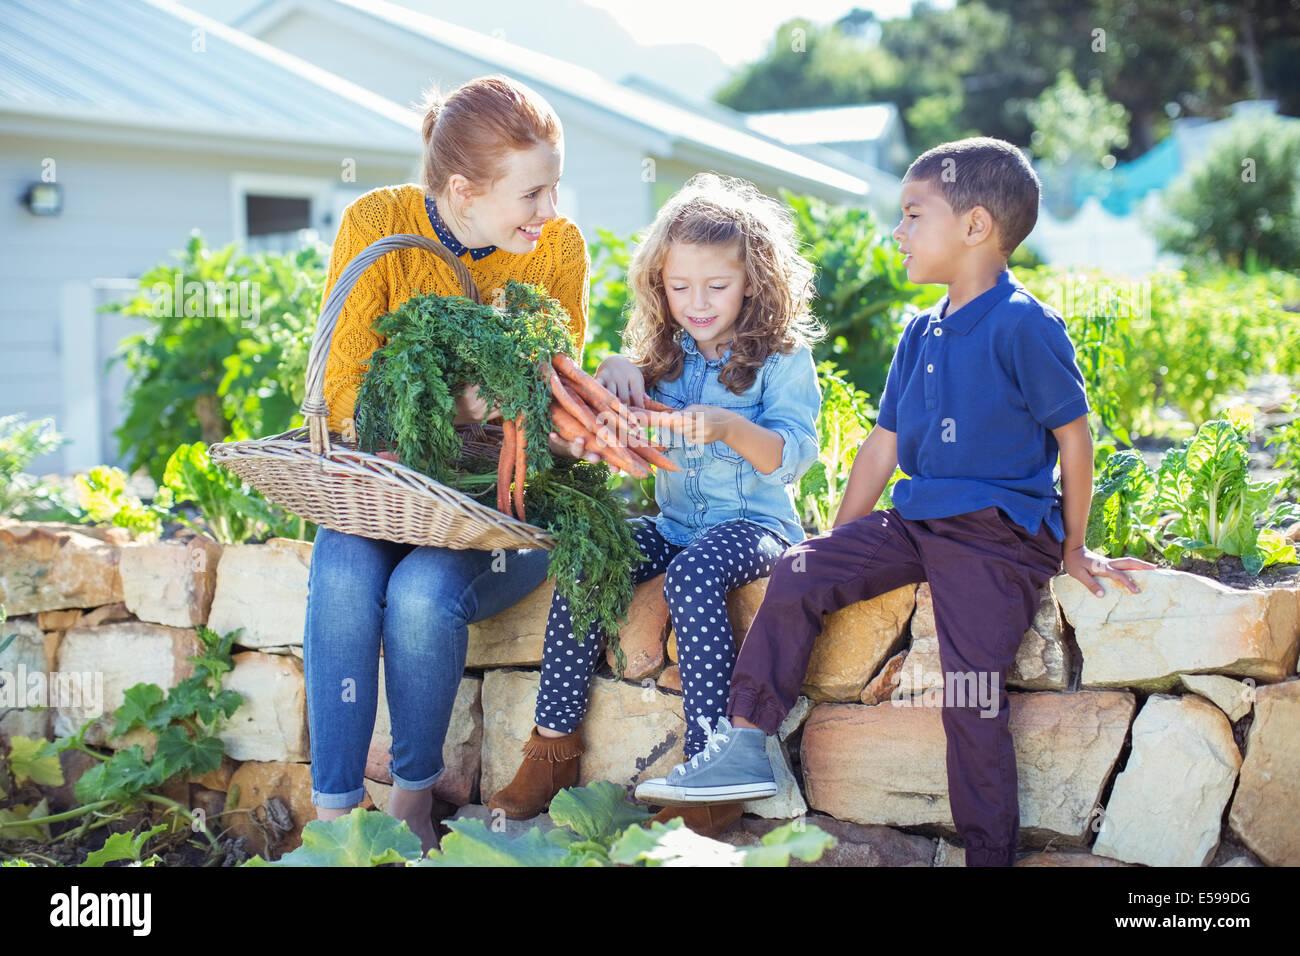 Lehrer und Schüler im Gemüsegarten Stockbild